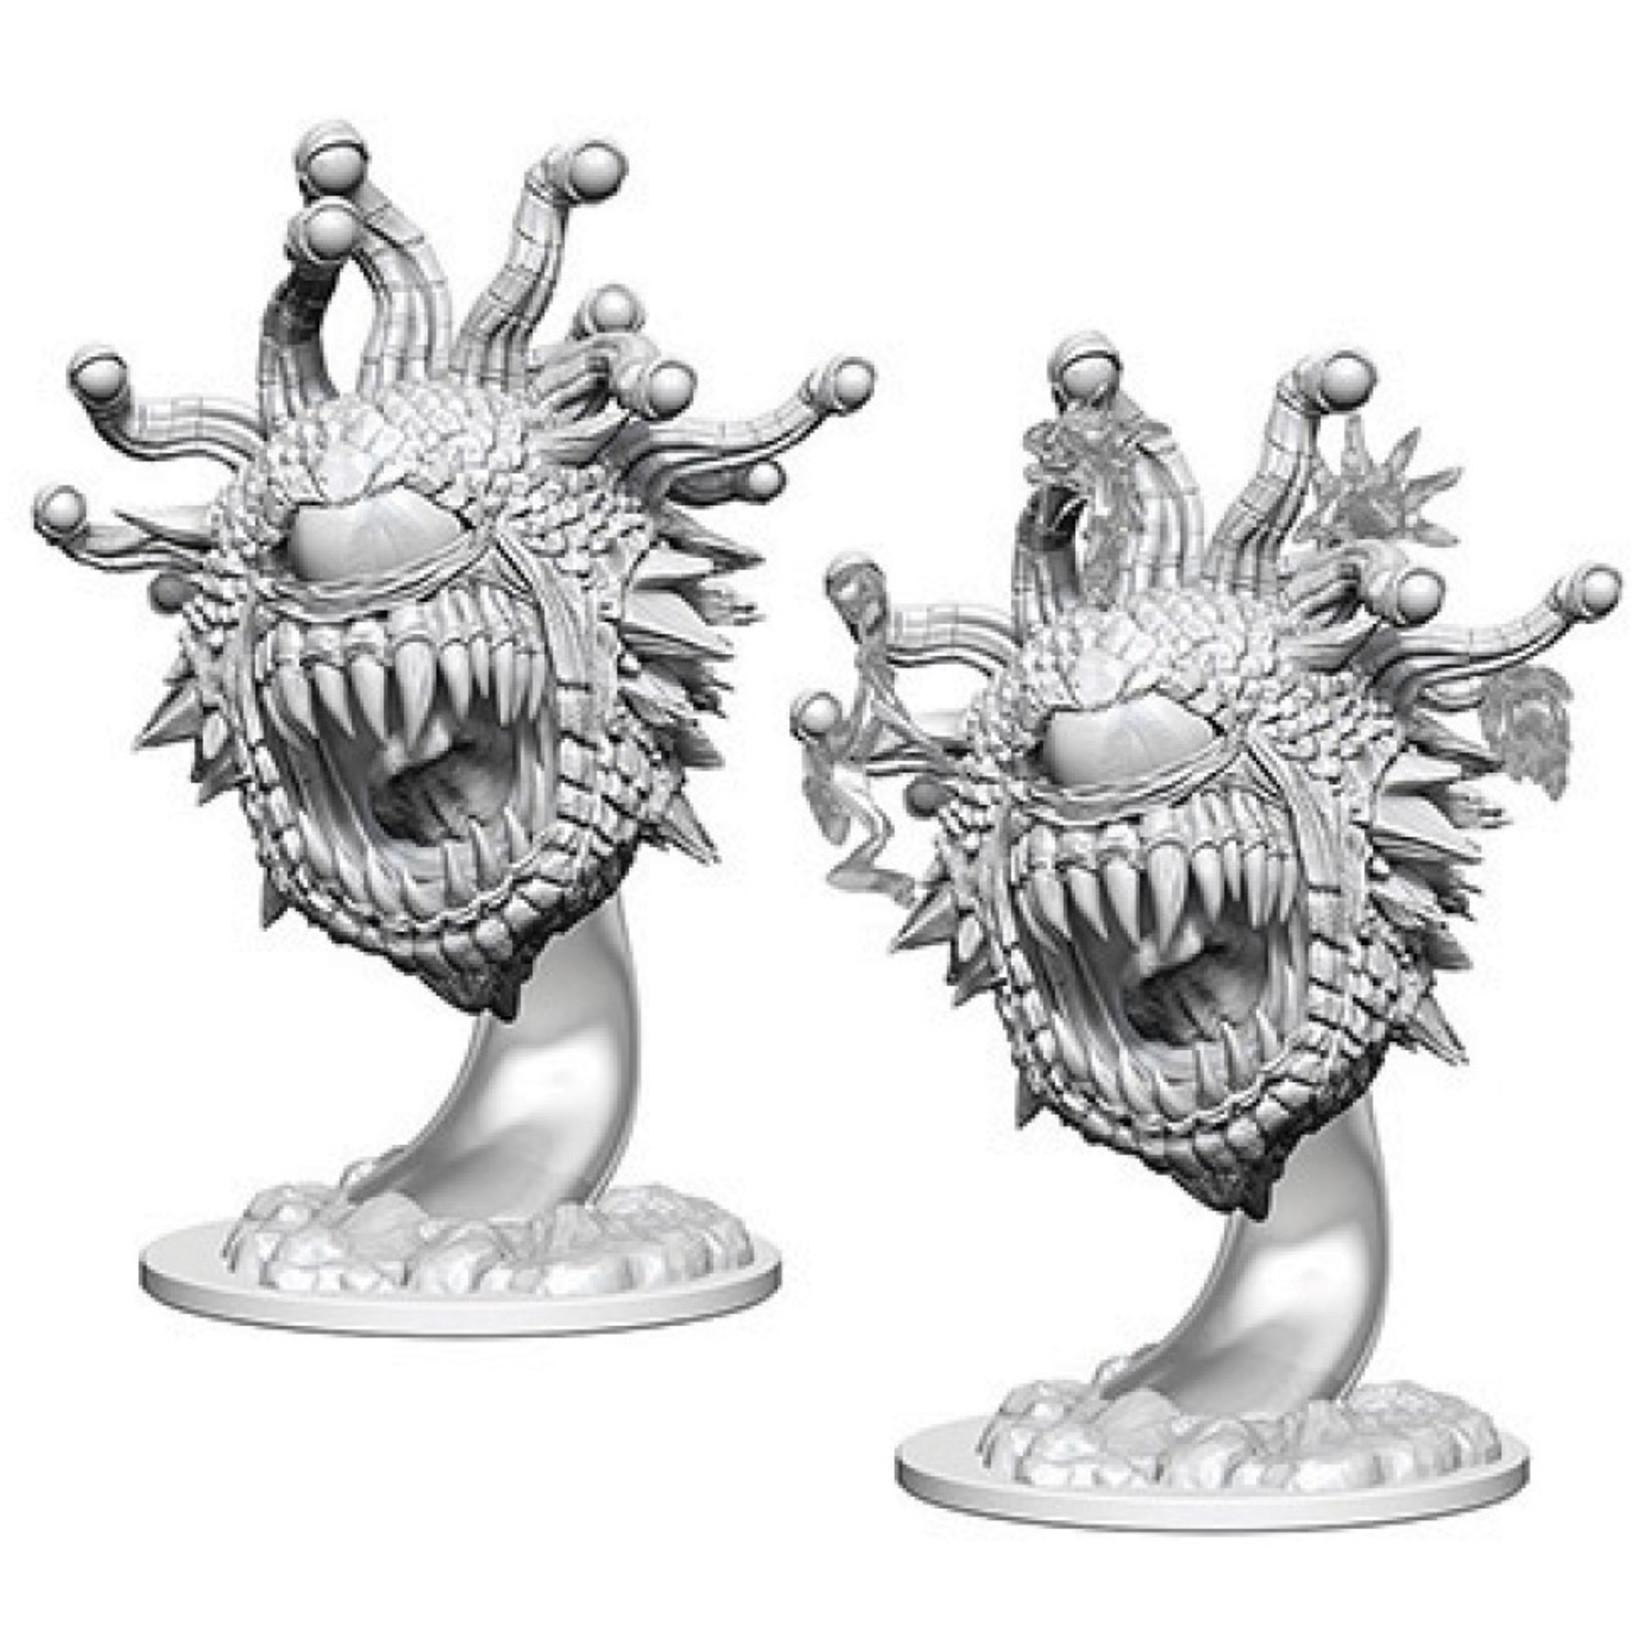 WizKids Dungeons & Dragons Nolzur's Marvelous Miniatures: Beholder